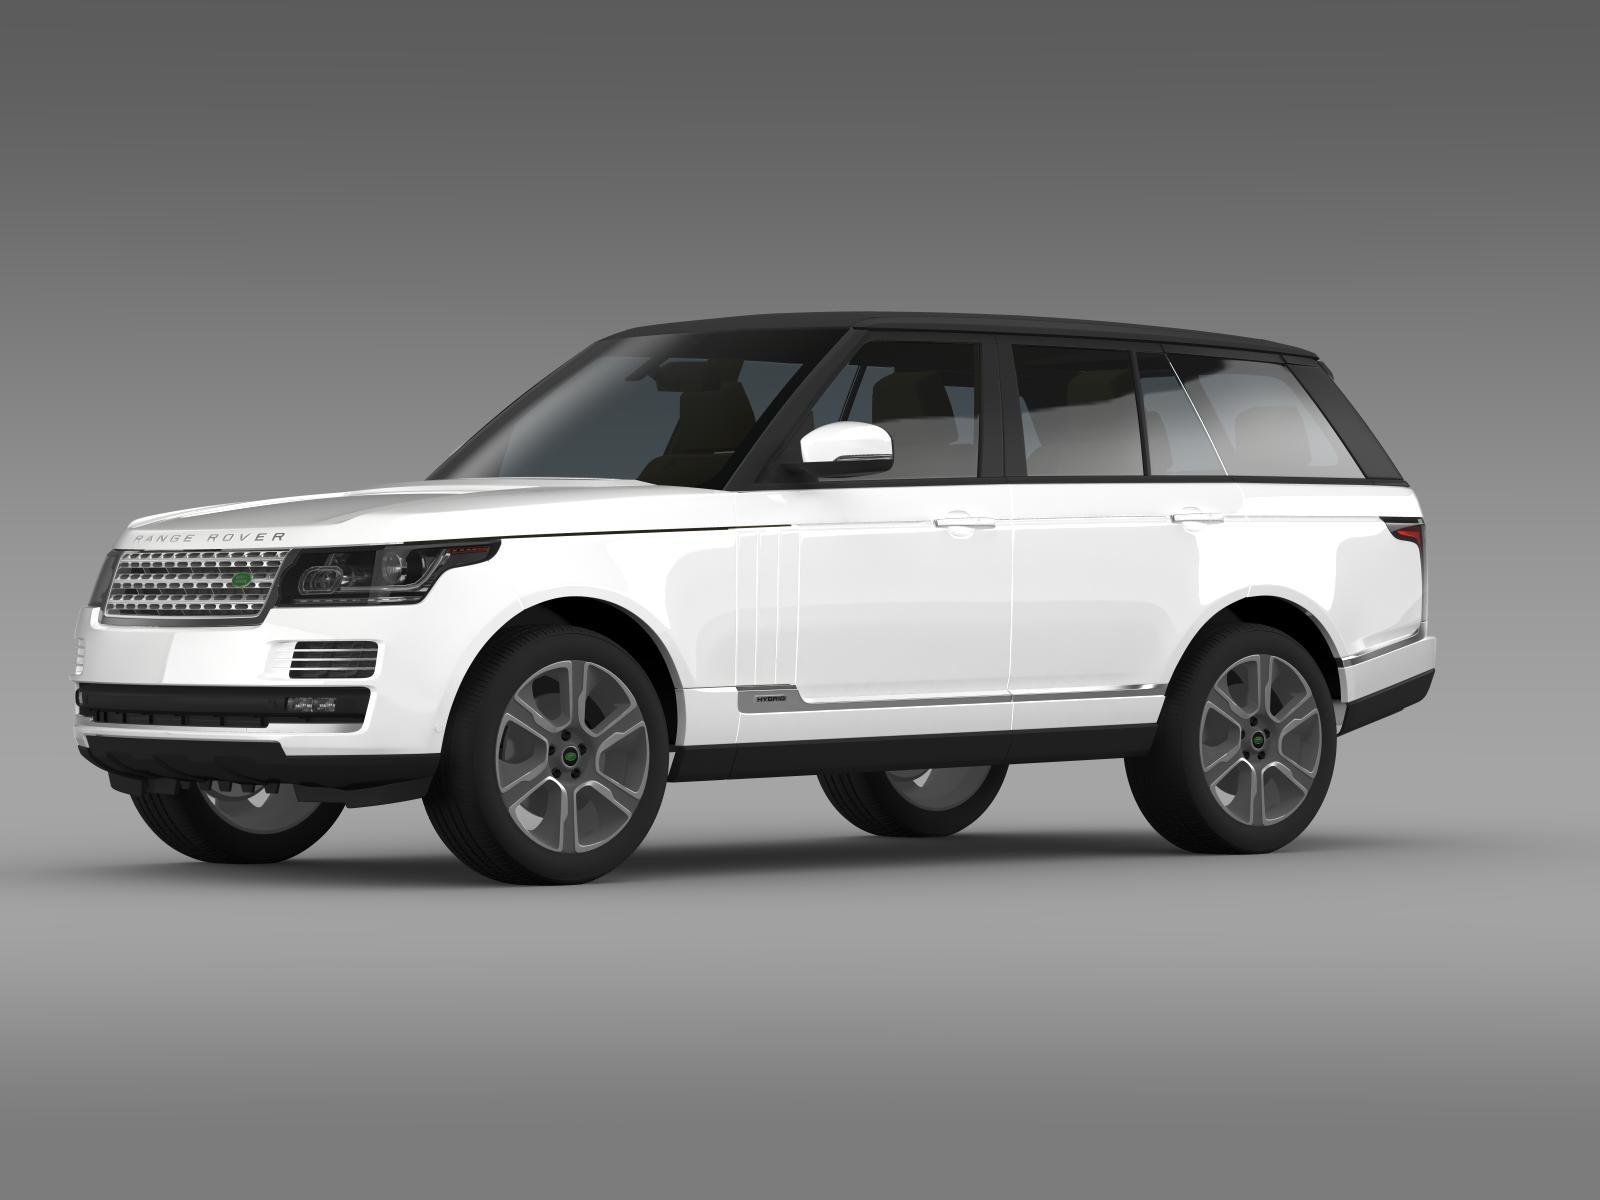 range rover autobiography hybrid l405 3d model 3ds max fbx c4d lwo ma mb hrc xsi obj 162080